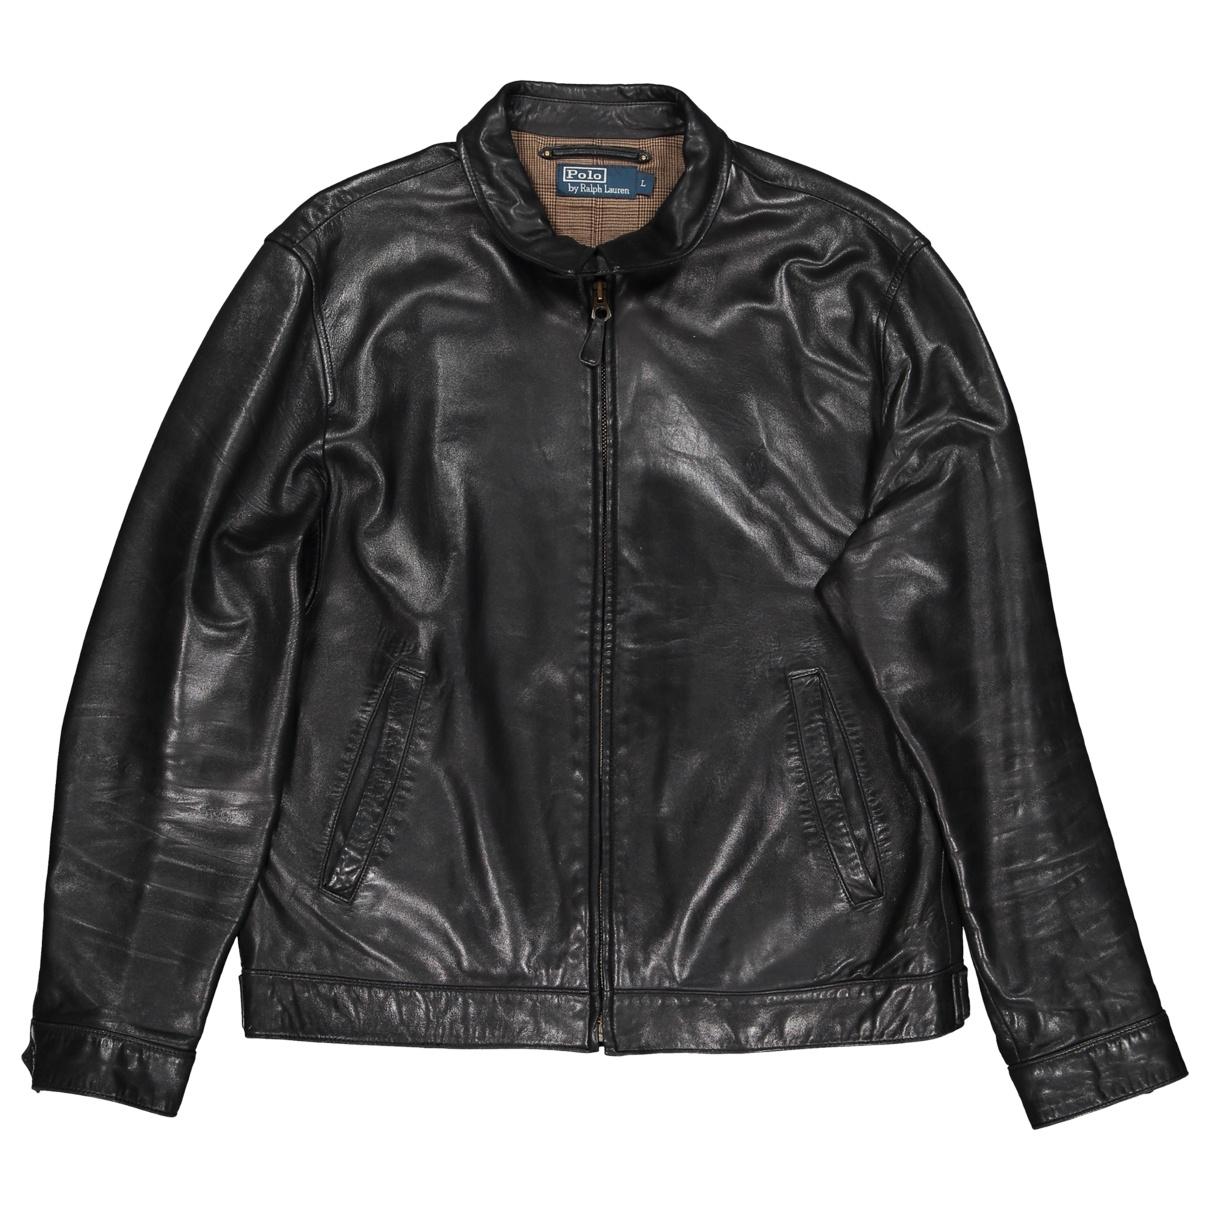 Ralph Lauren Collection \N Black Leather jacket  for Men L International